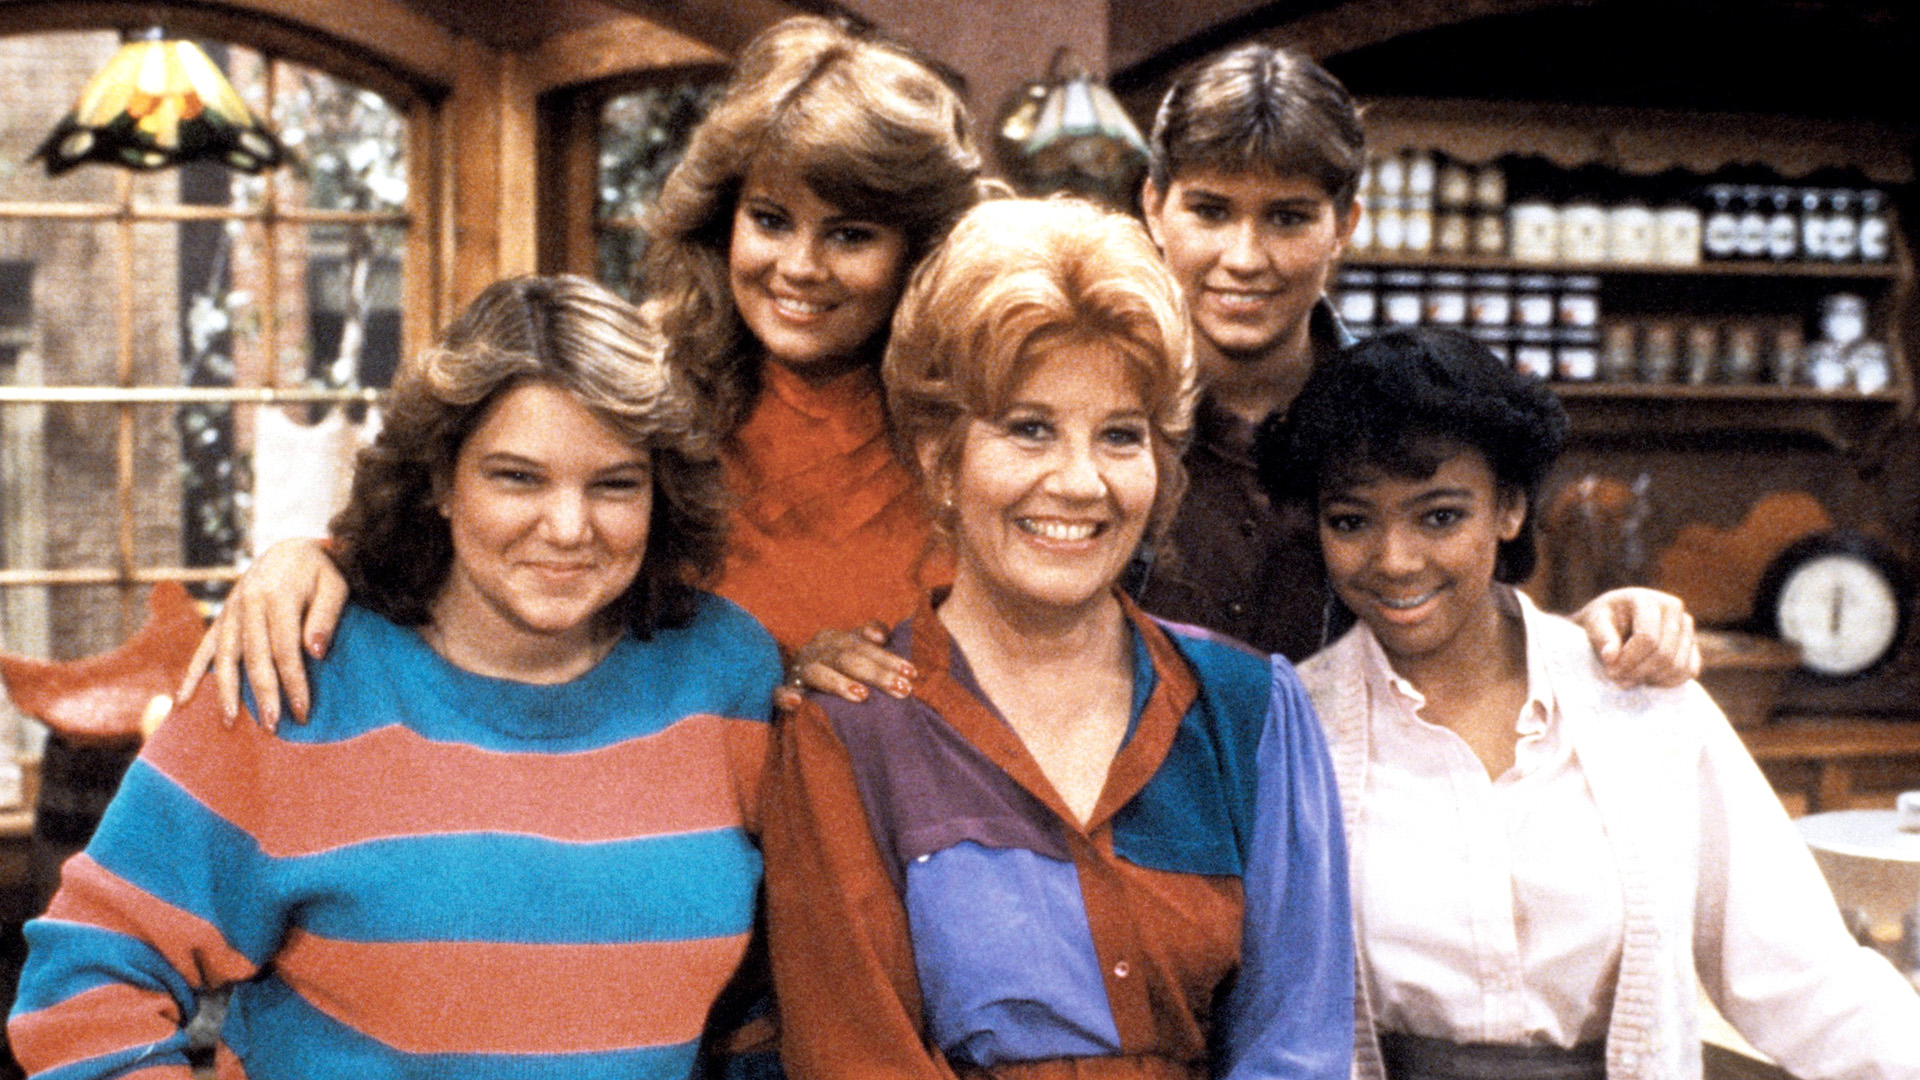 THE FACTS OF LIFE, Mindy Cohn, Lisa Whelchel, Charlotte Rae, Nancy McKeon, Kim Fields, 1979 88.